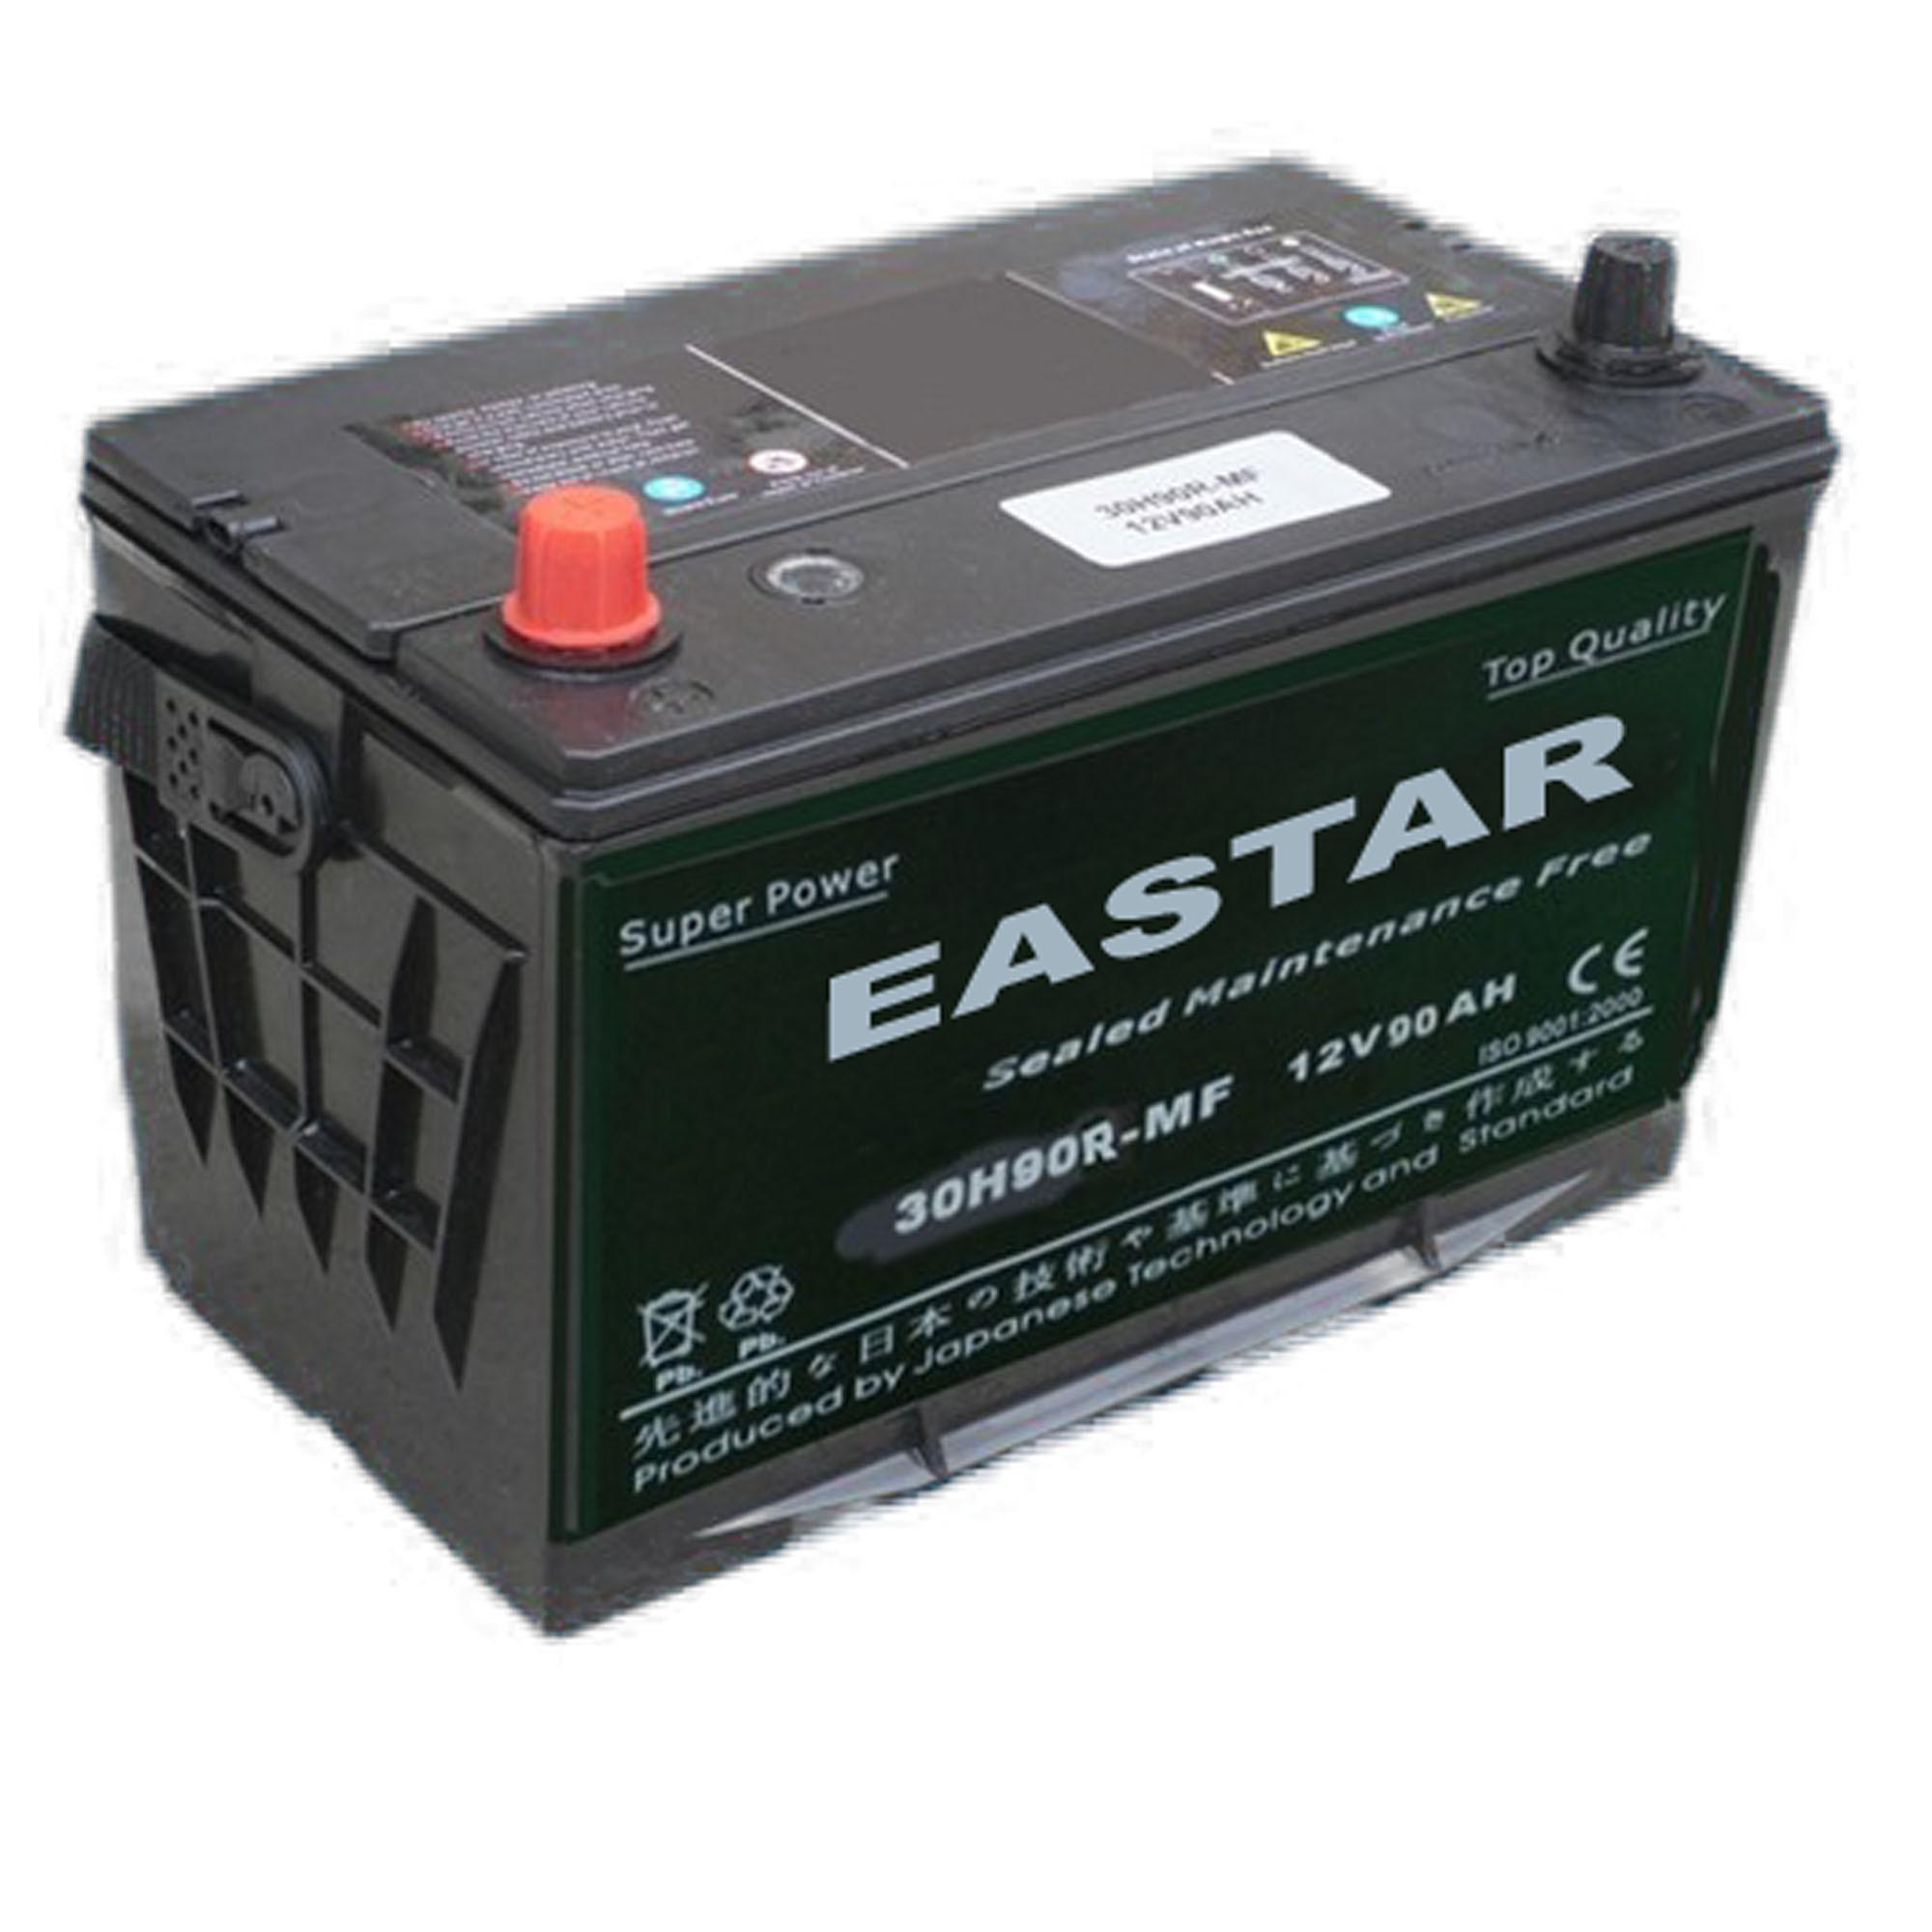 N200 12V 200ah Mf Auto Battery